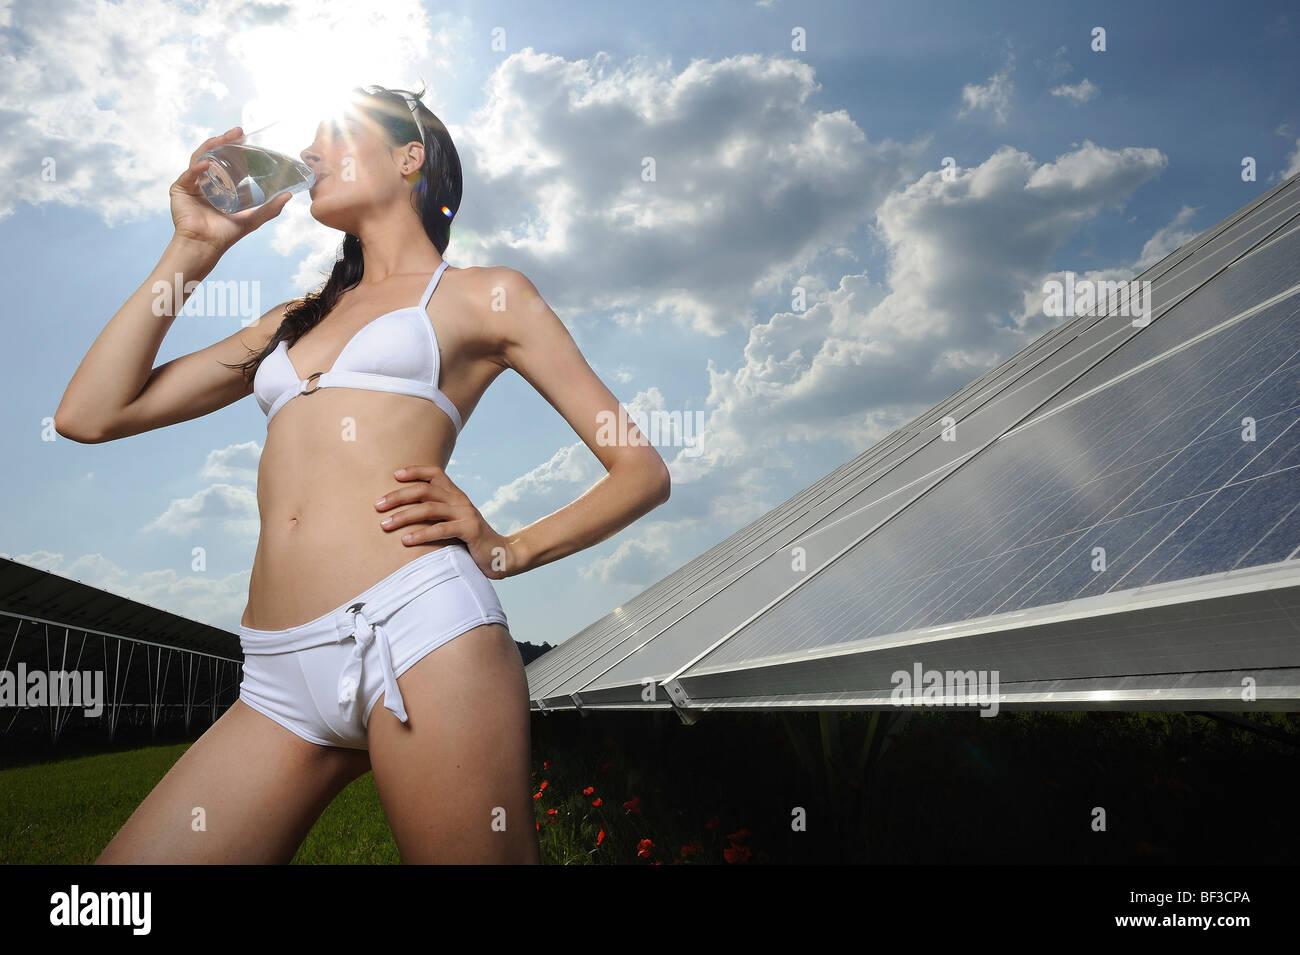 Mujer de agua potable cerca de panel solar Imagen De Stock